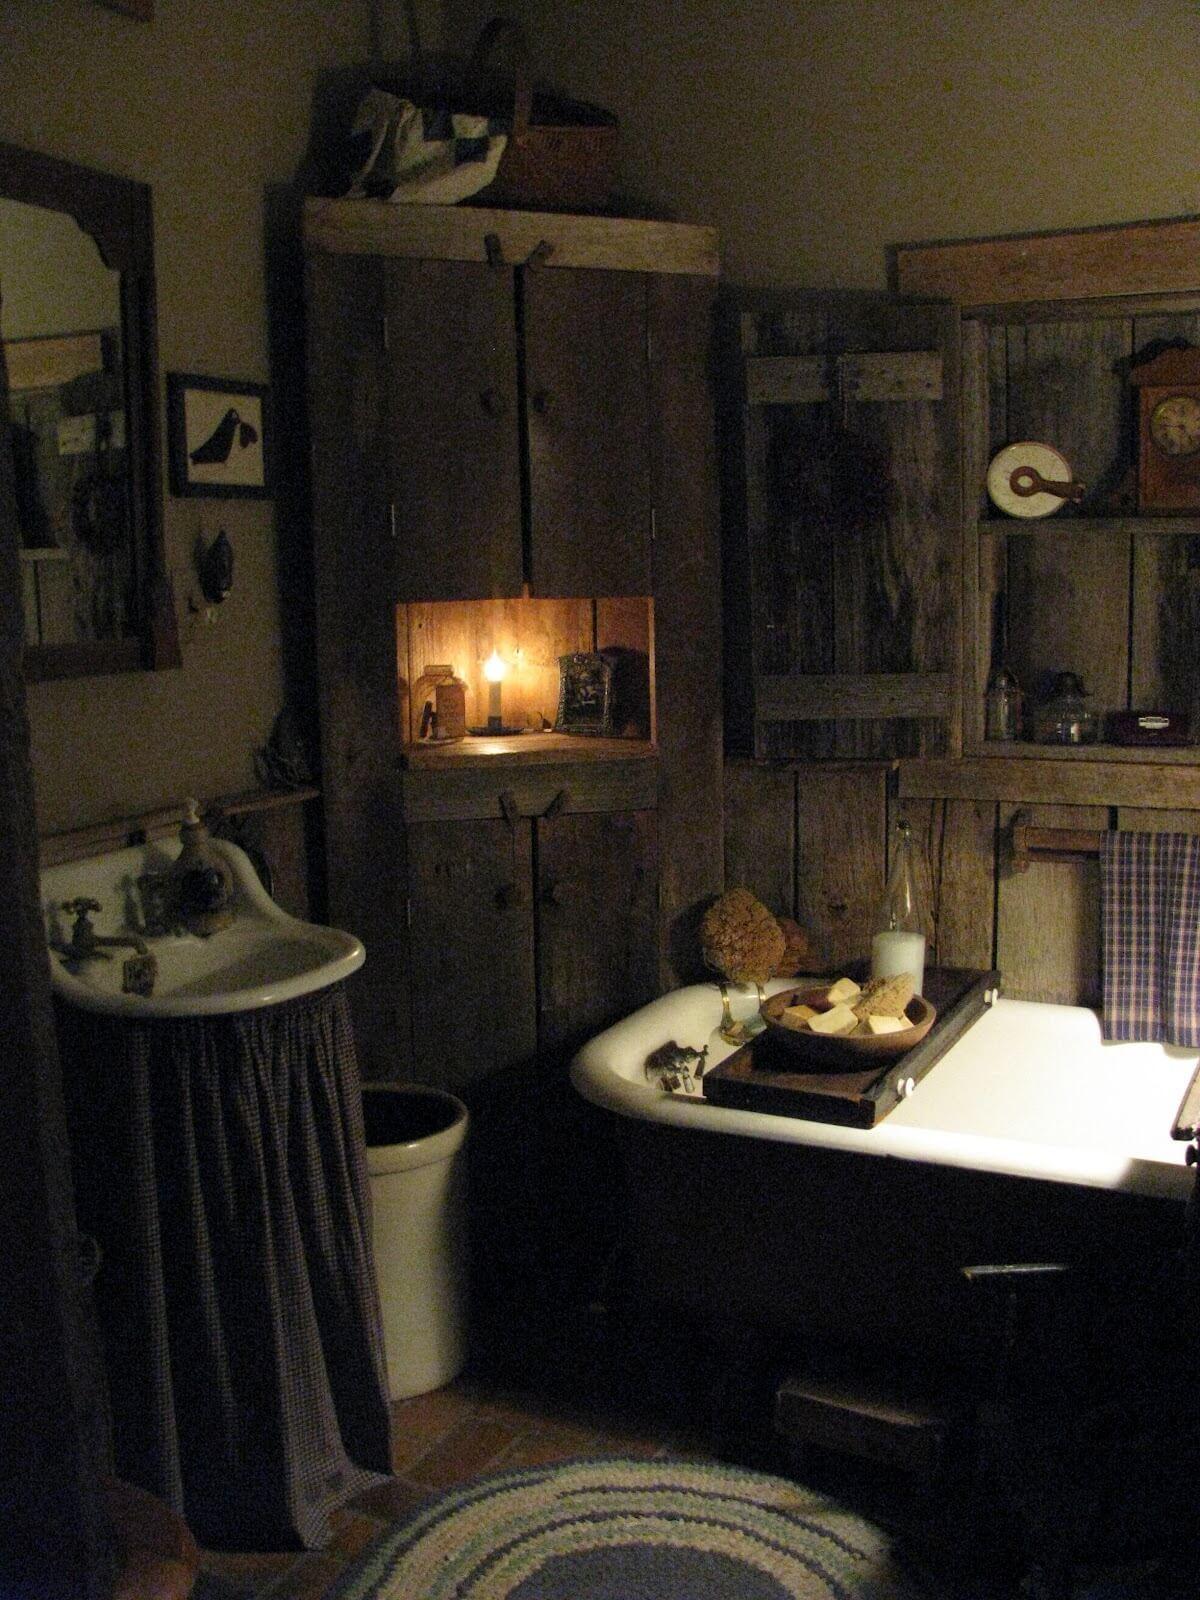 10 Primitive Bathroom Ideas 2020 For Modern Citizens Primitive Bathroom Decor Country Bathroom Decor Primitive Country Bathrooms